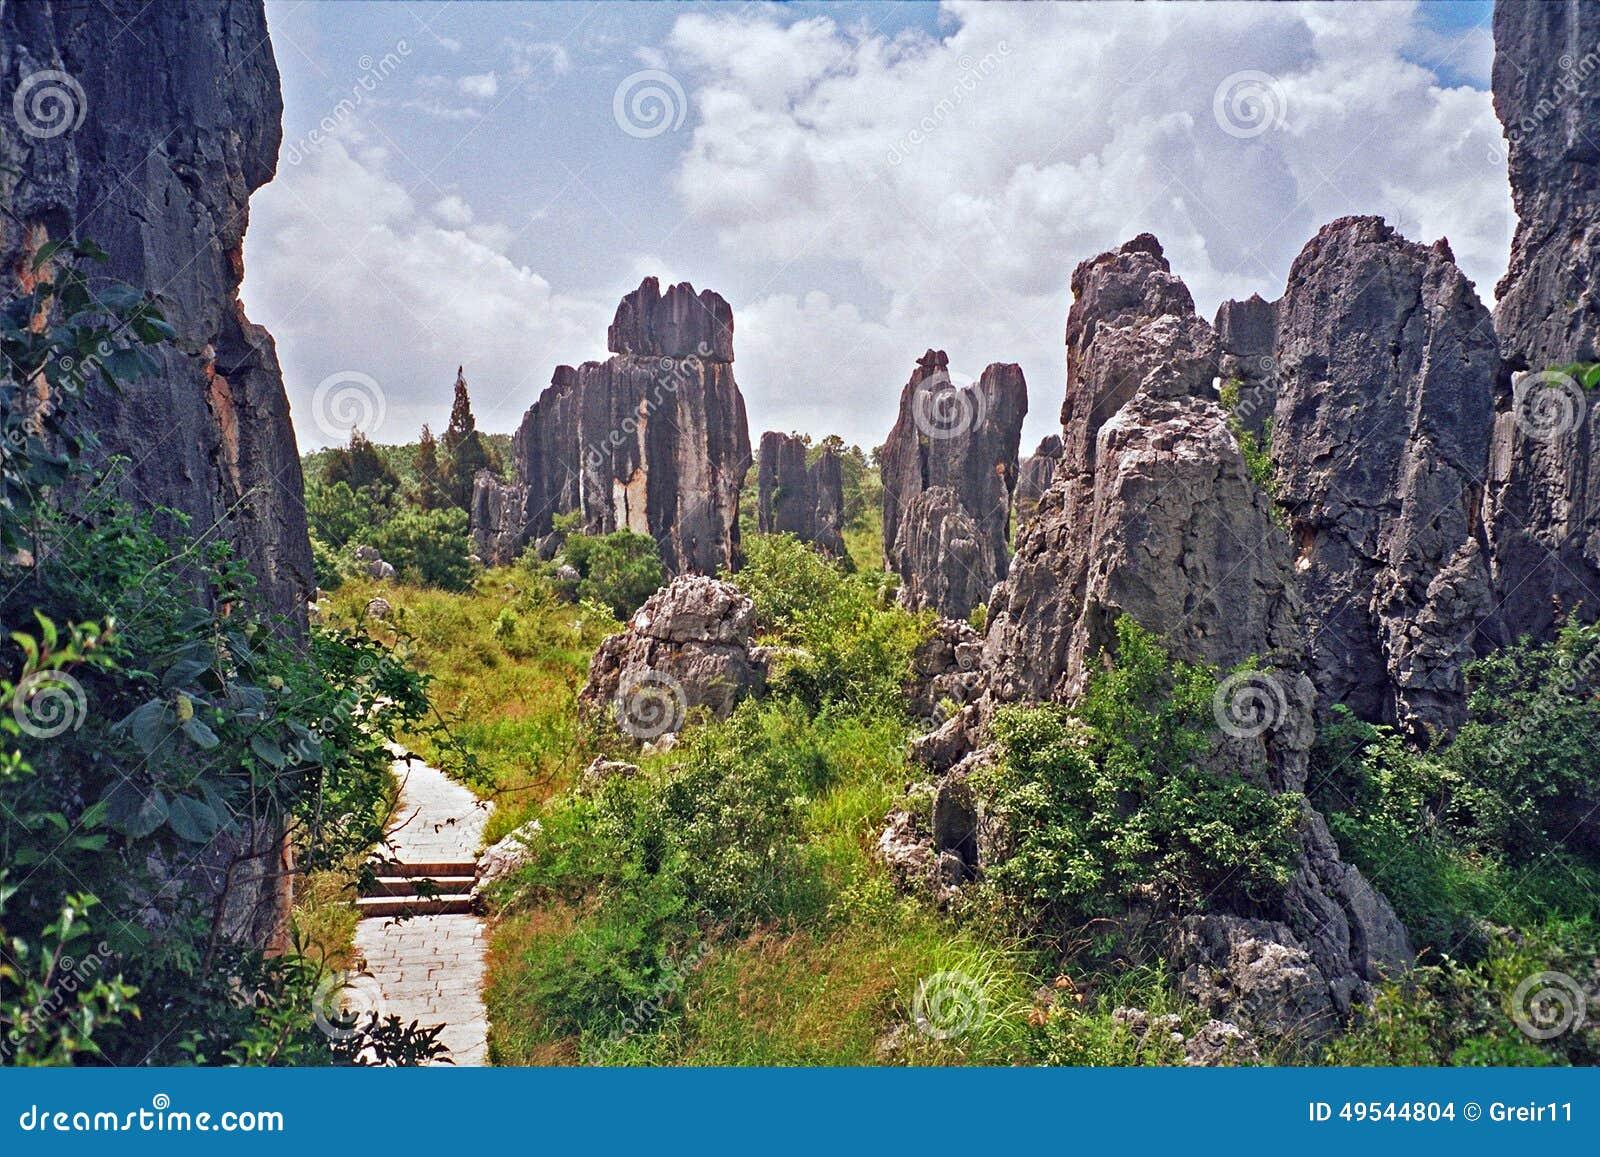 shilin -石森林的片段-在云南的昆明,瓷附近.图片